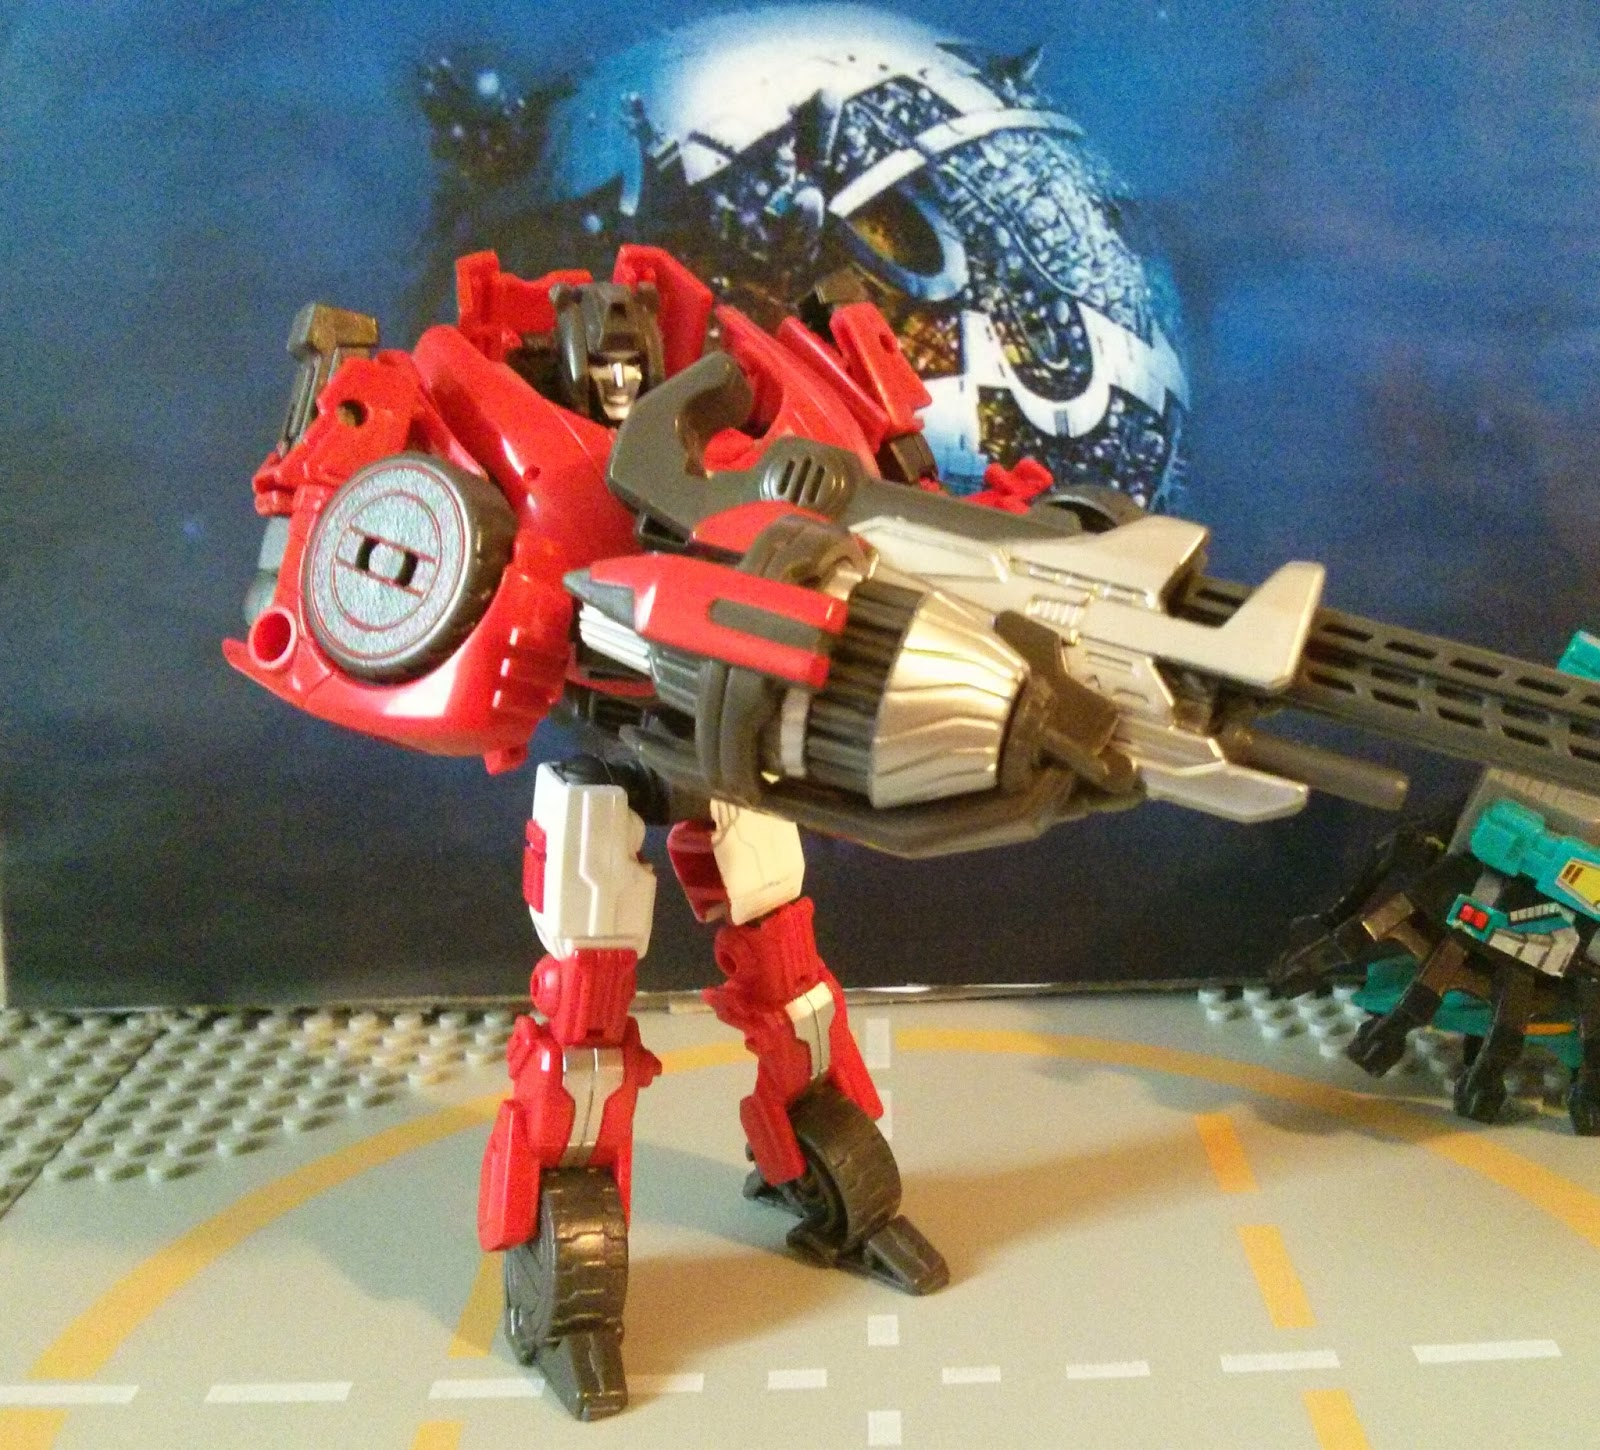 foc sideswipe and gun